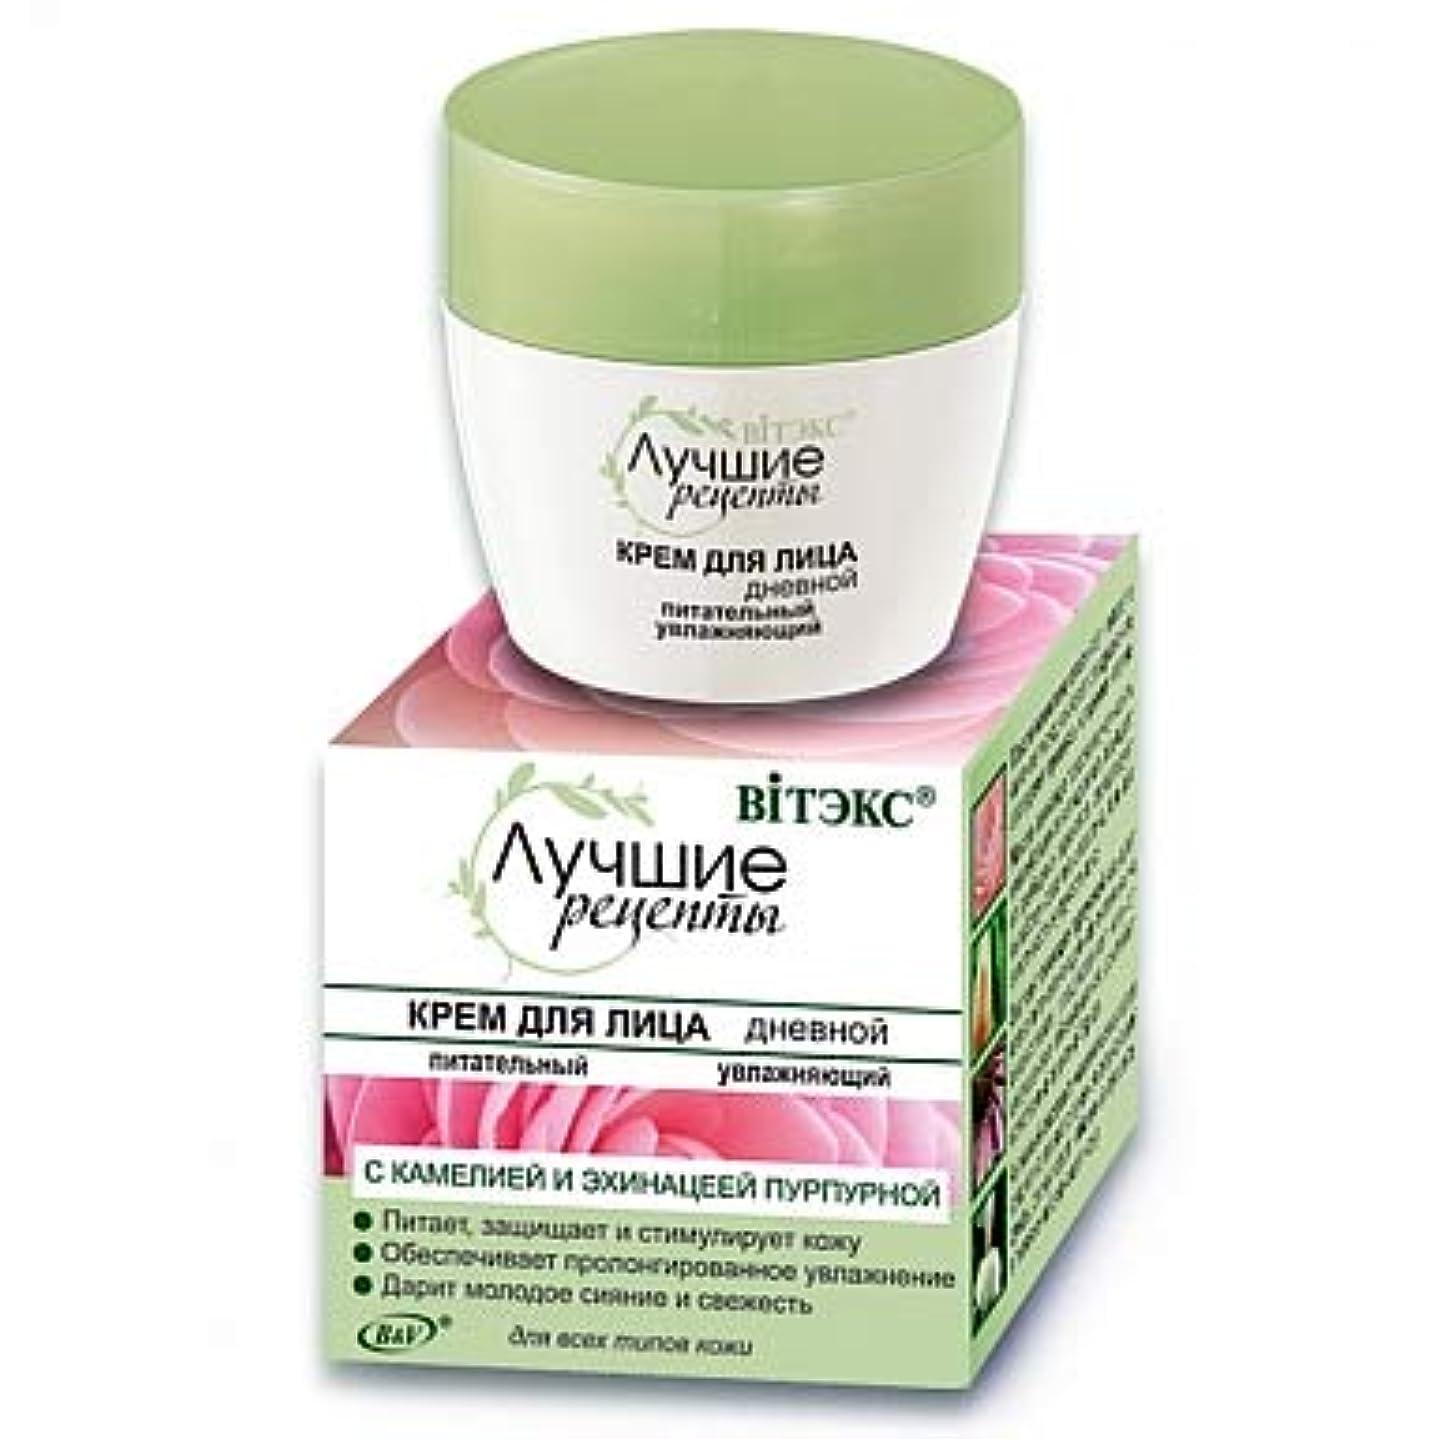 Bielita & Vitex Best Recipes Line   Nourishing Moisturizing Day Face Cream for All Skin Types, 45 ml   Camellia...